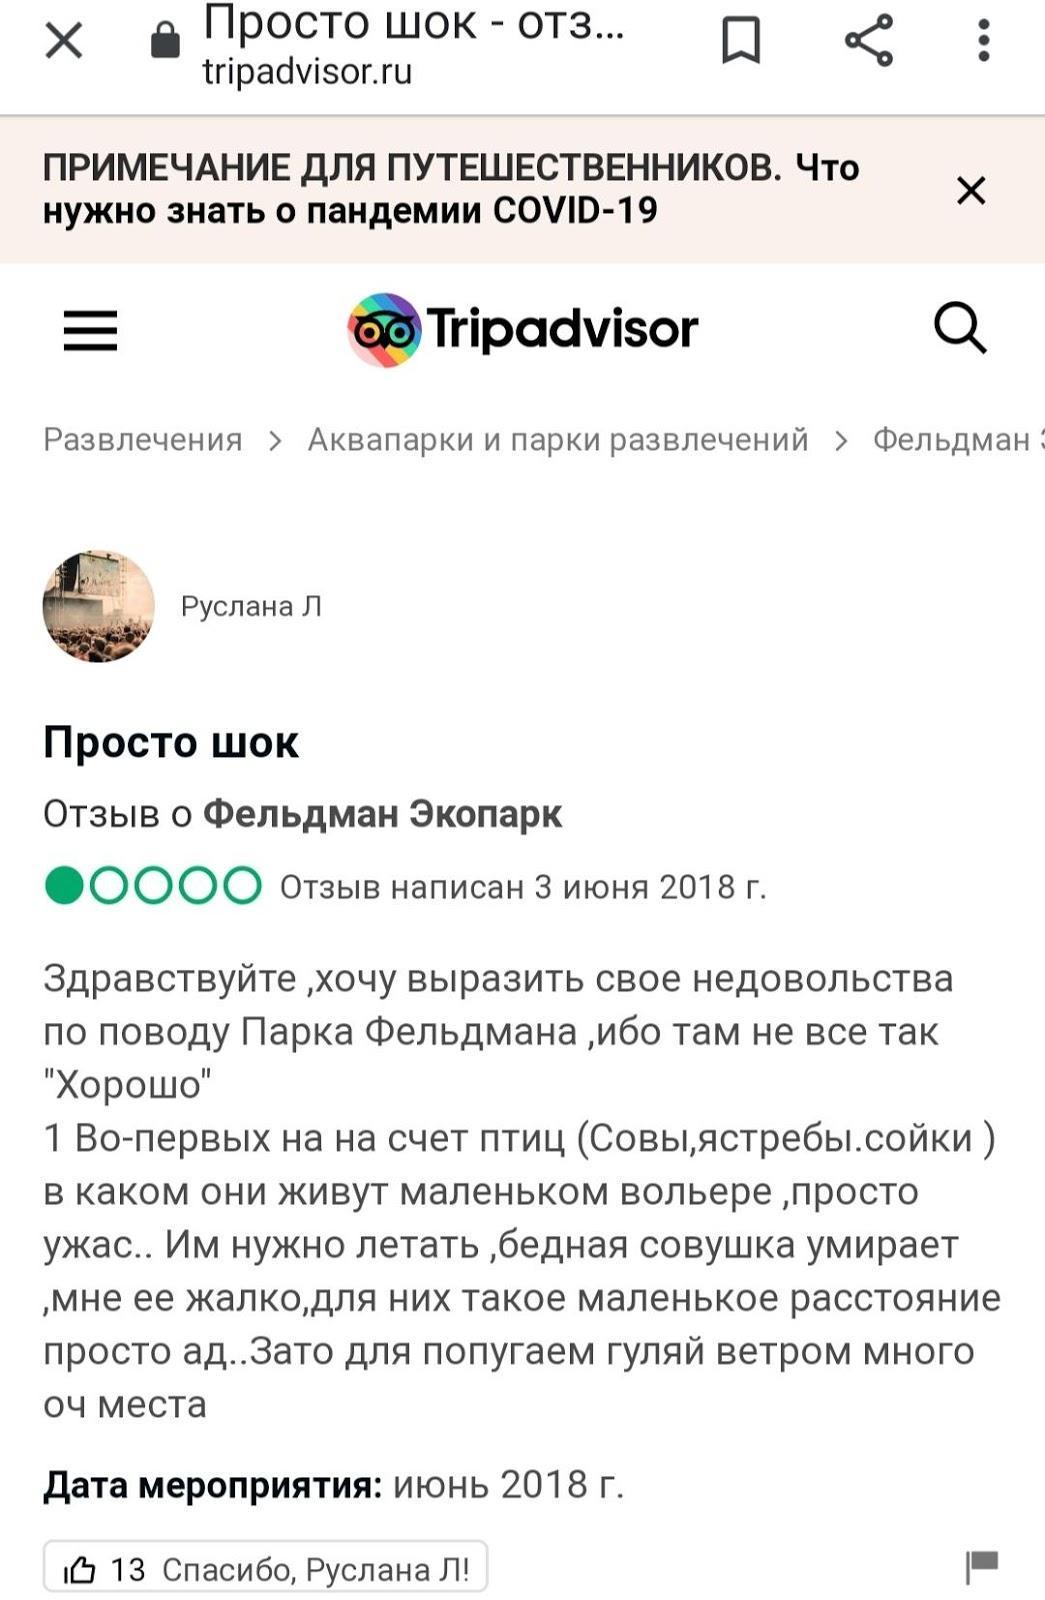 C:\Users\Наталья\Downloads\IMG_20200618_131955.jpg